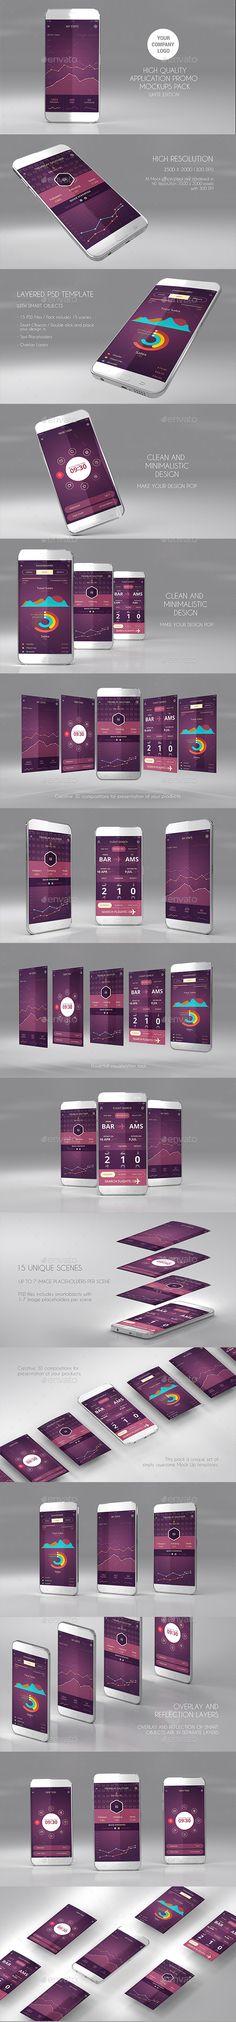 15 App Promo Mock Ups Pack (White Edition). Download here: https://graphicriver.net/item/15-app-promo-mock-ups-pack-white-edition/17568243?ref=ksioks